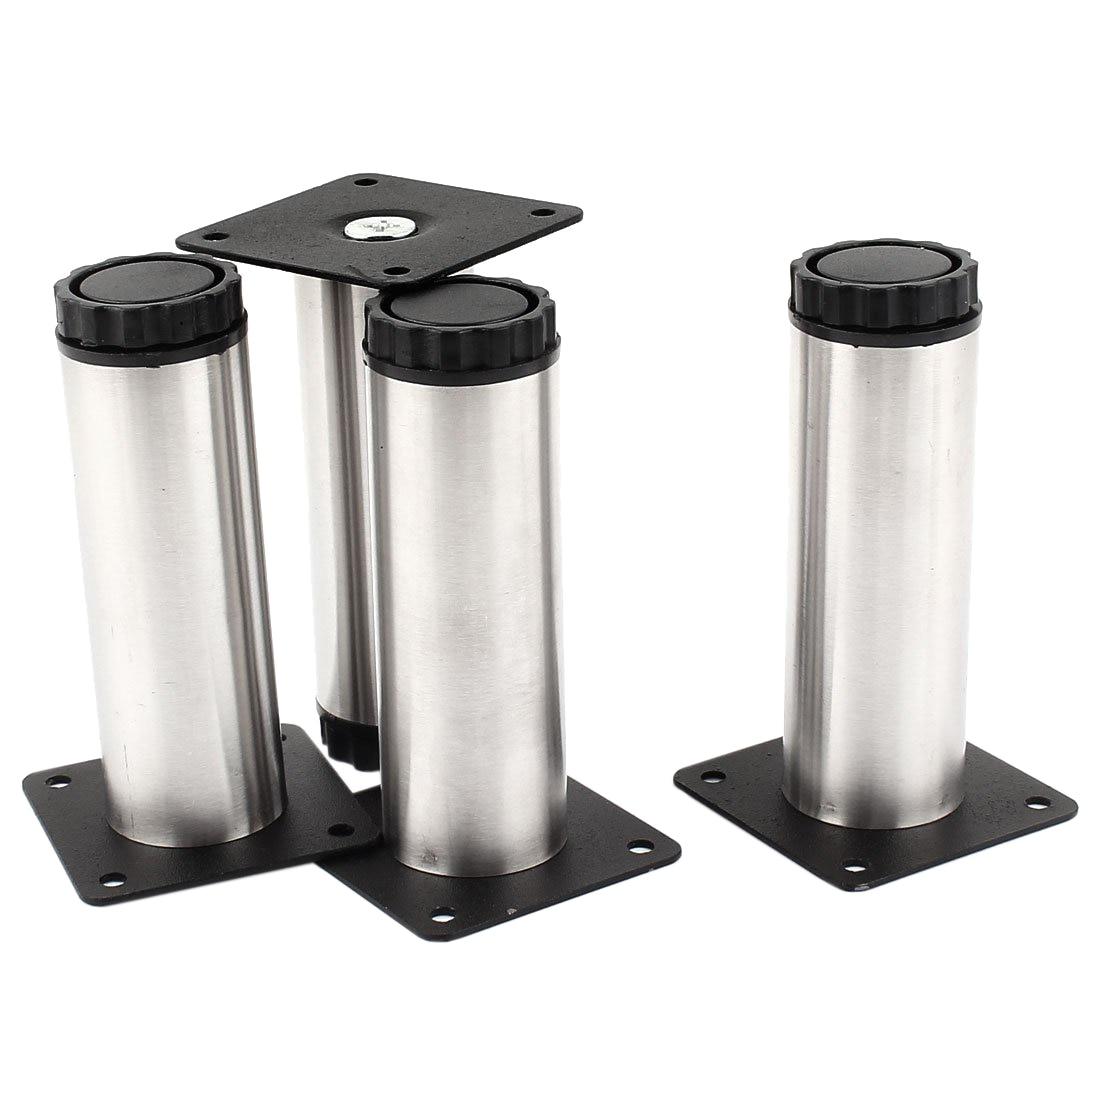 Kitchen Cupboard Cylinder Adjustable Cabinet Legs Plinth 4pcs